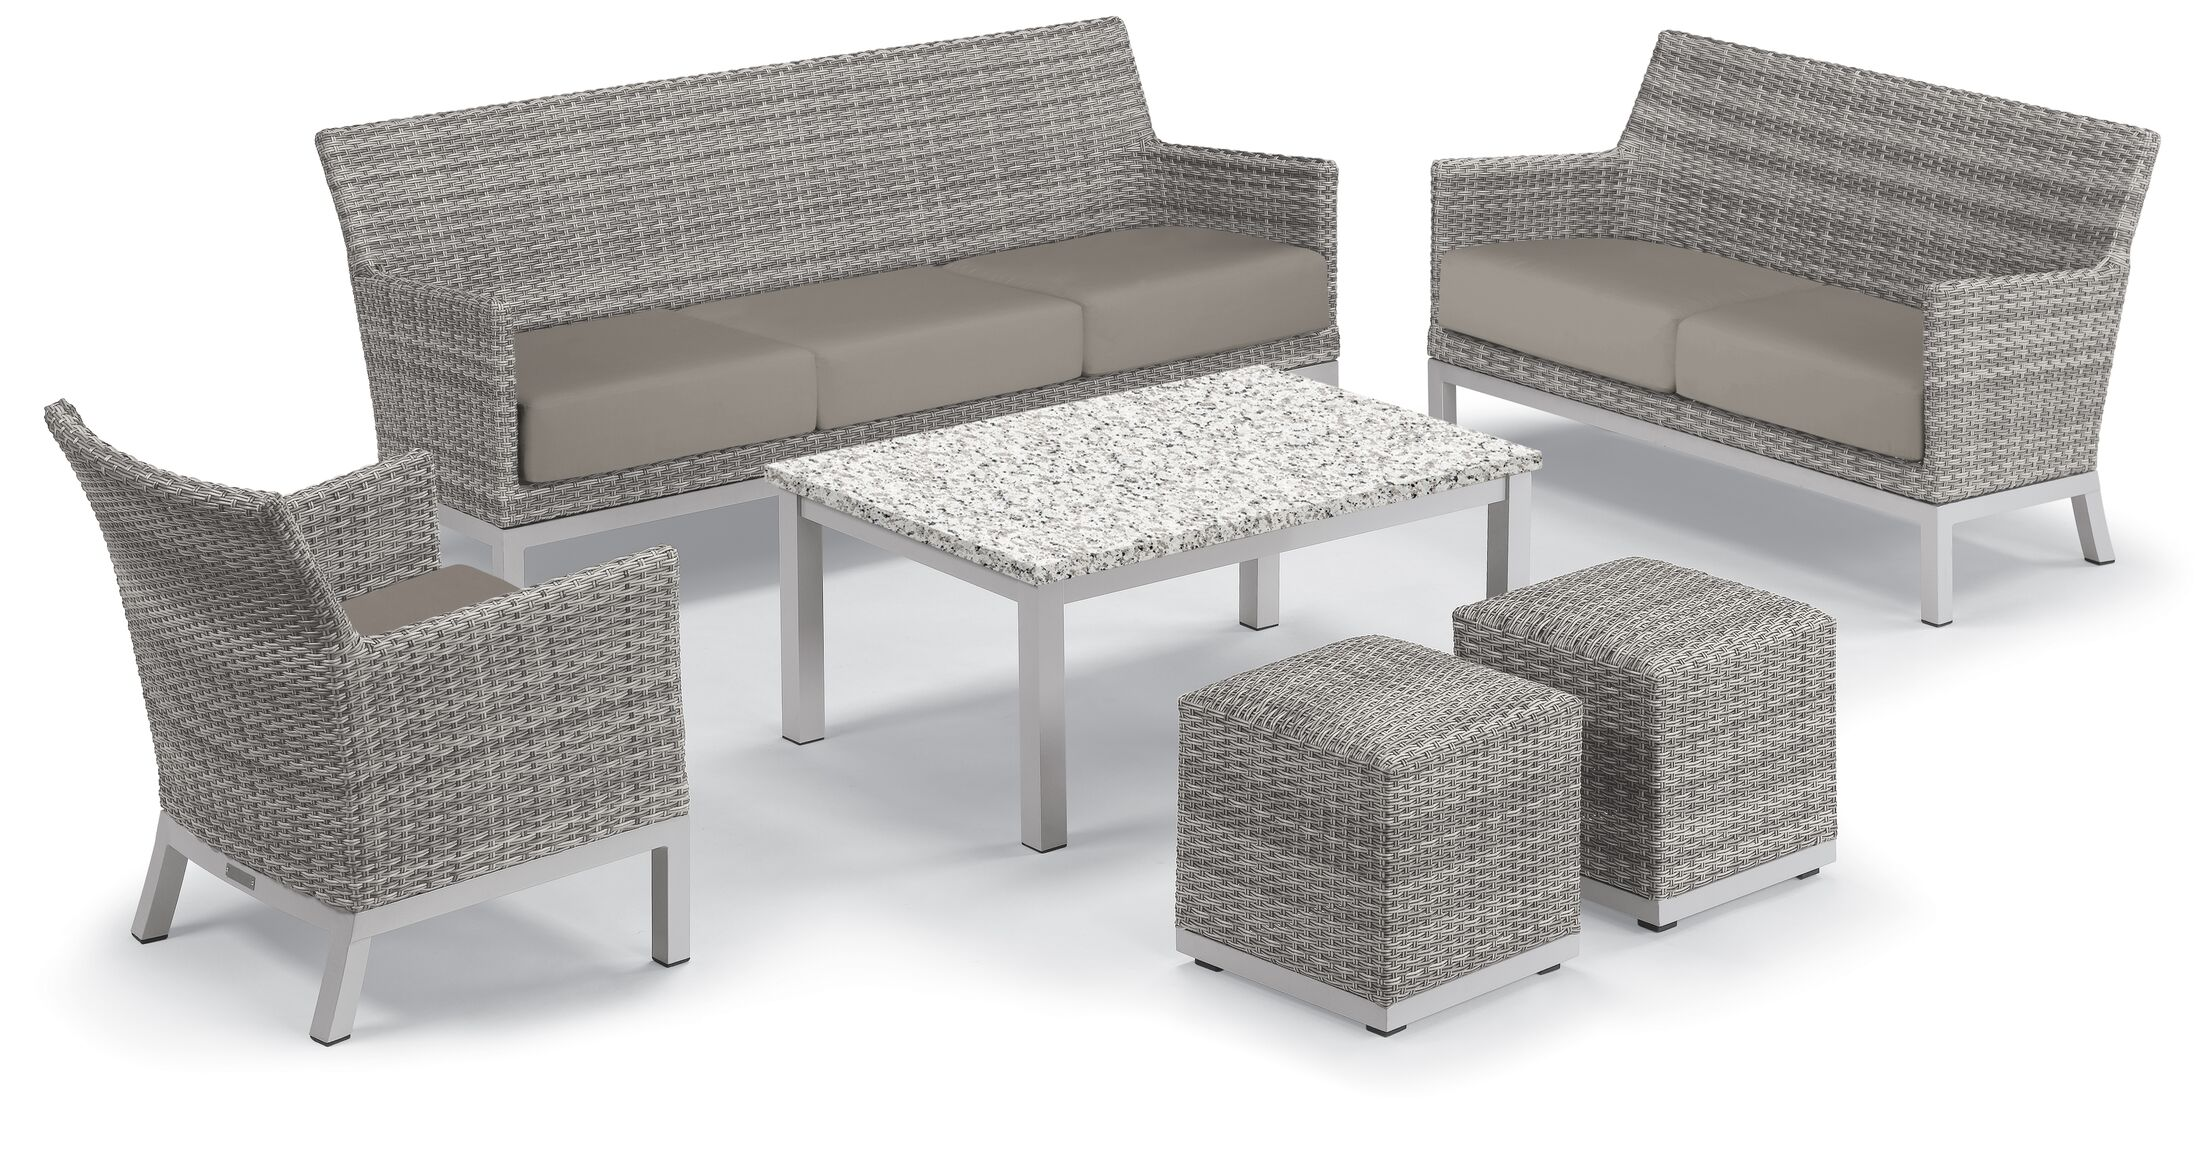 Linndale 6 Piece Rattan Conversation Set with Cushions Cushion Color: Stone, Table Top Color: Lite-Core Ash